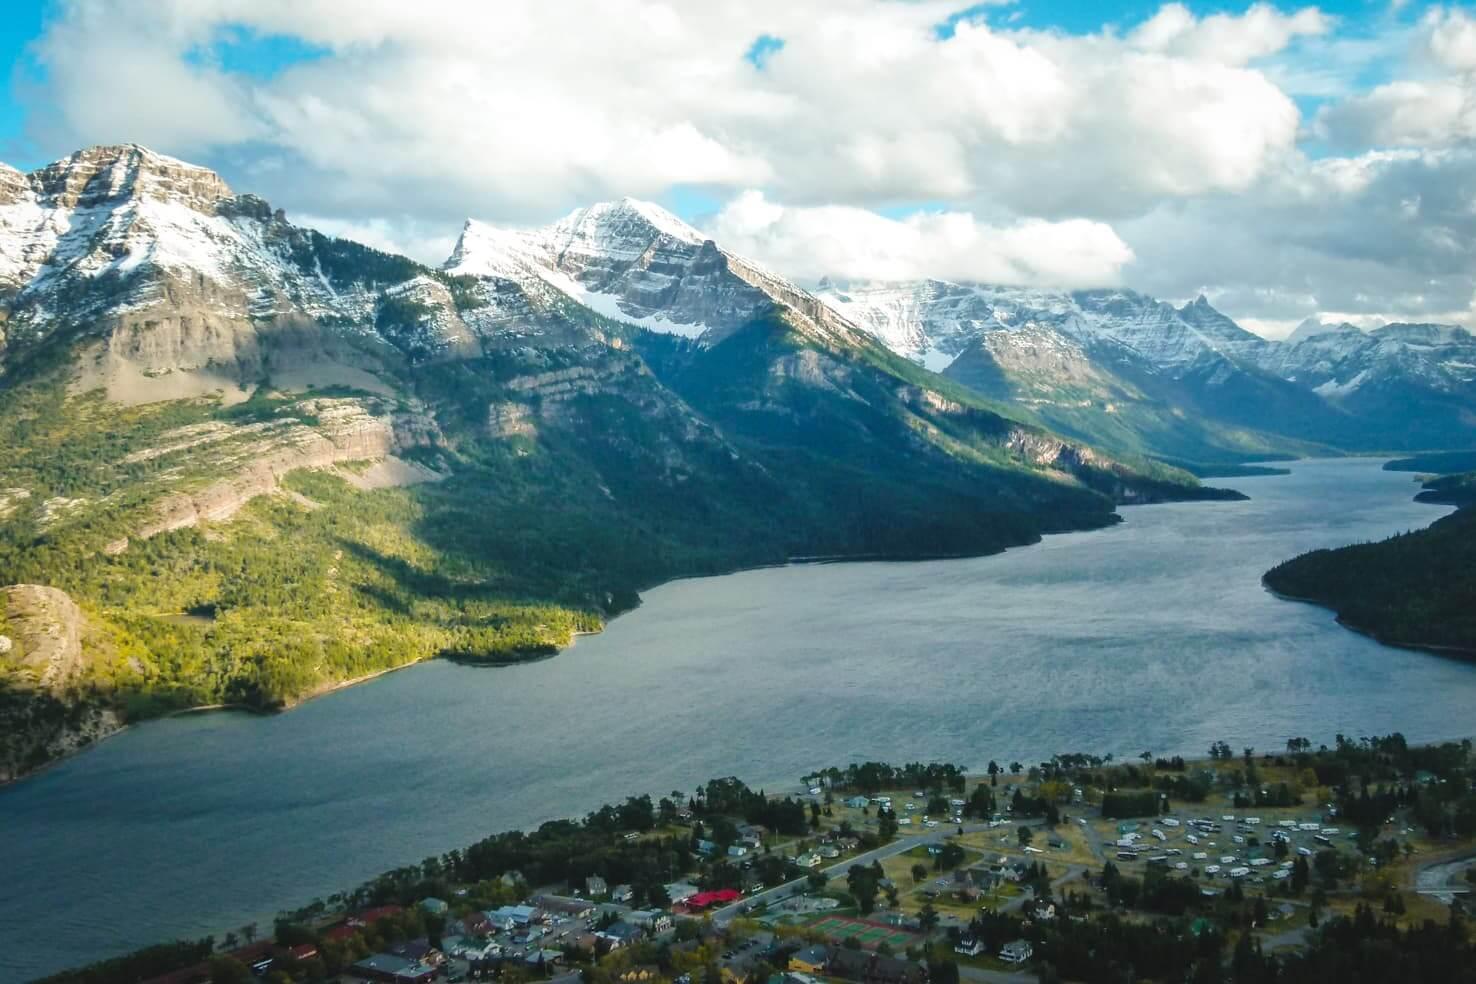 Canadian Rockies road trip itinerary - Bears Hump Hike in Waterton Lakes National Park